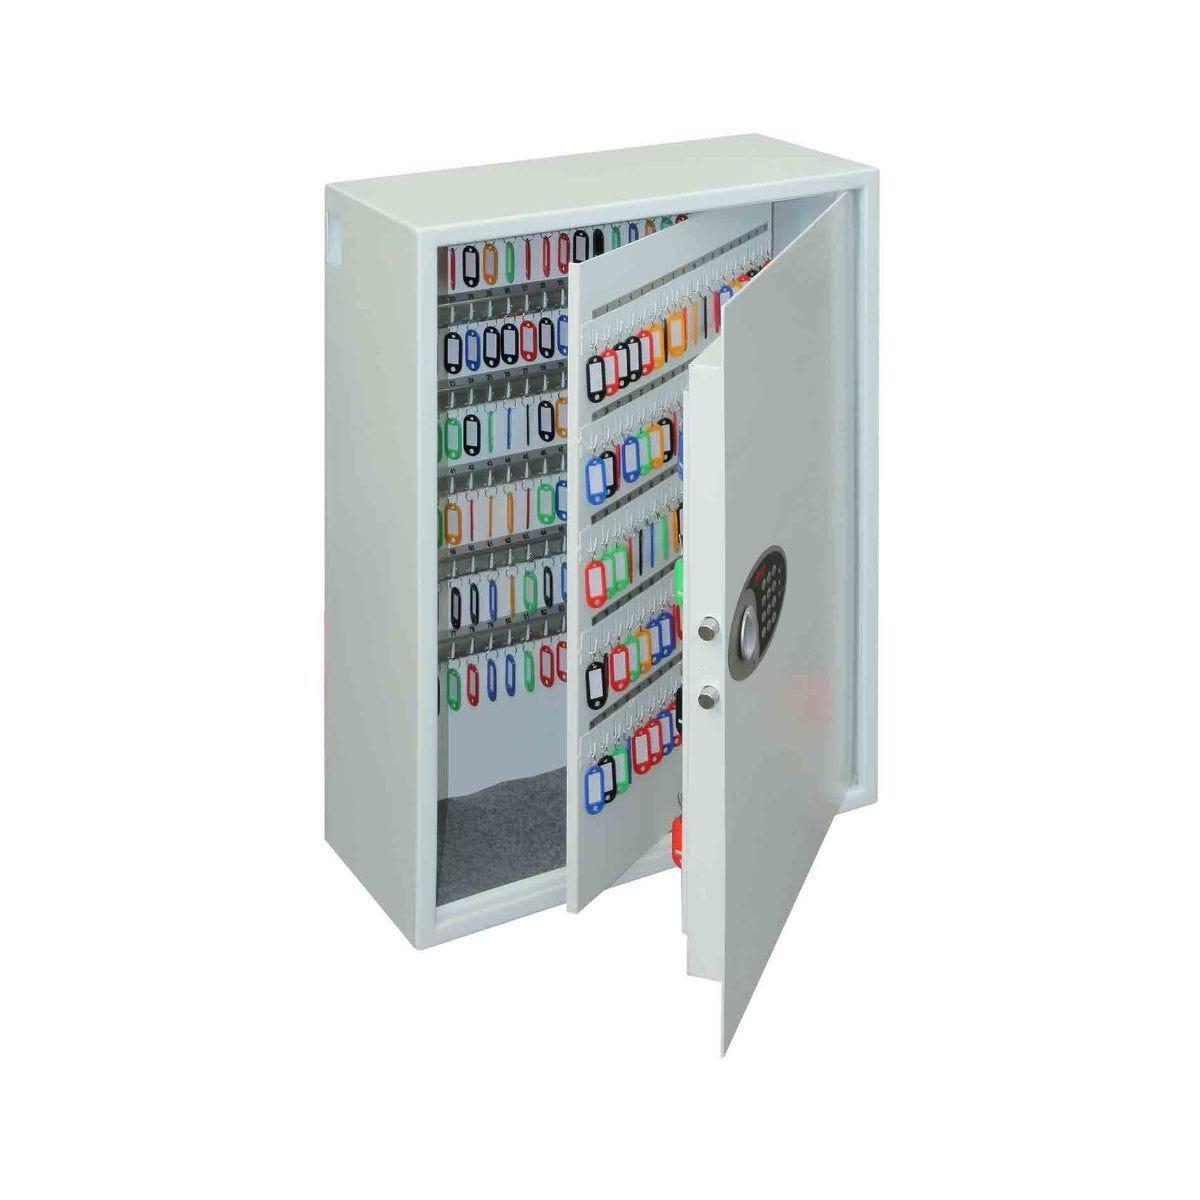 Phoenix Cygnus KS0034E Key Deposit Safe with Electronic Lock 300 Hook